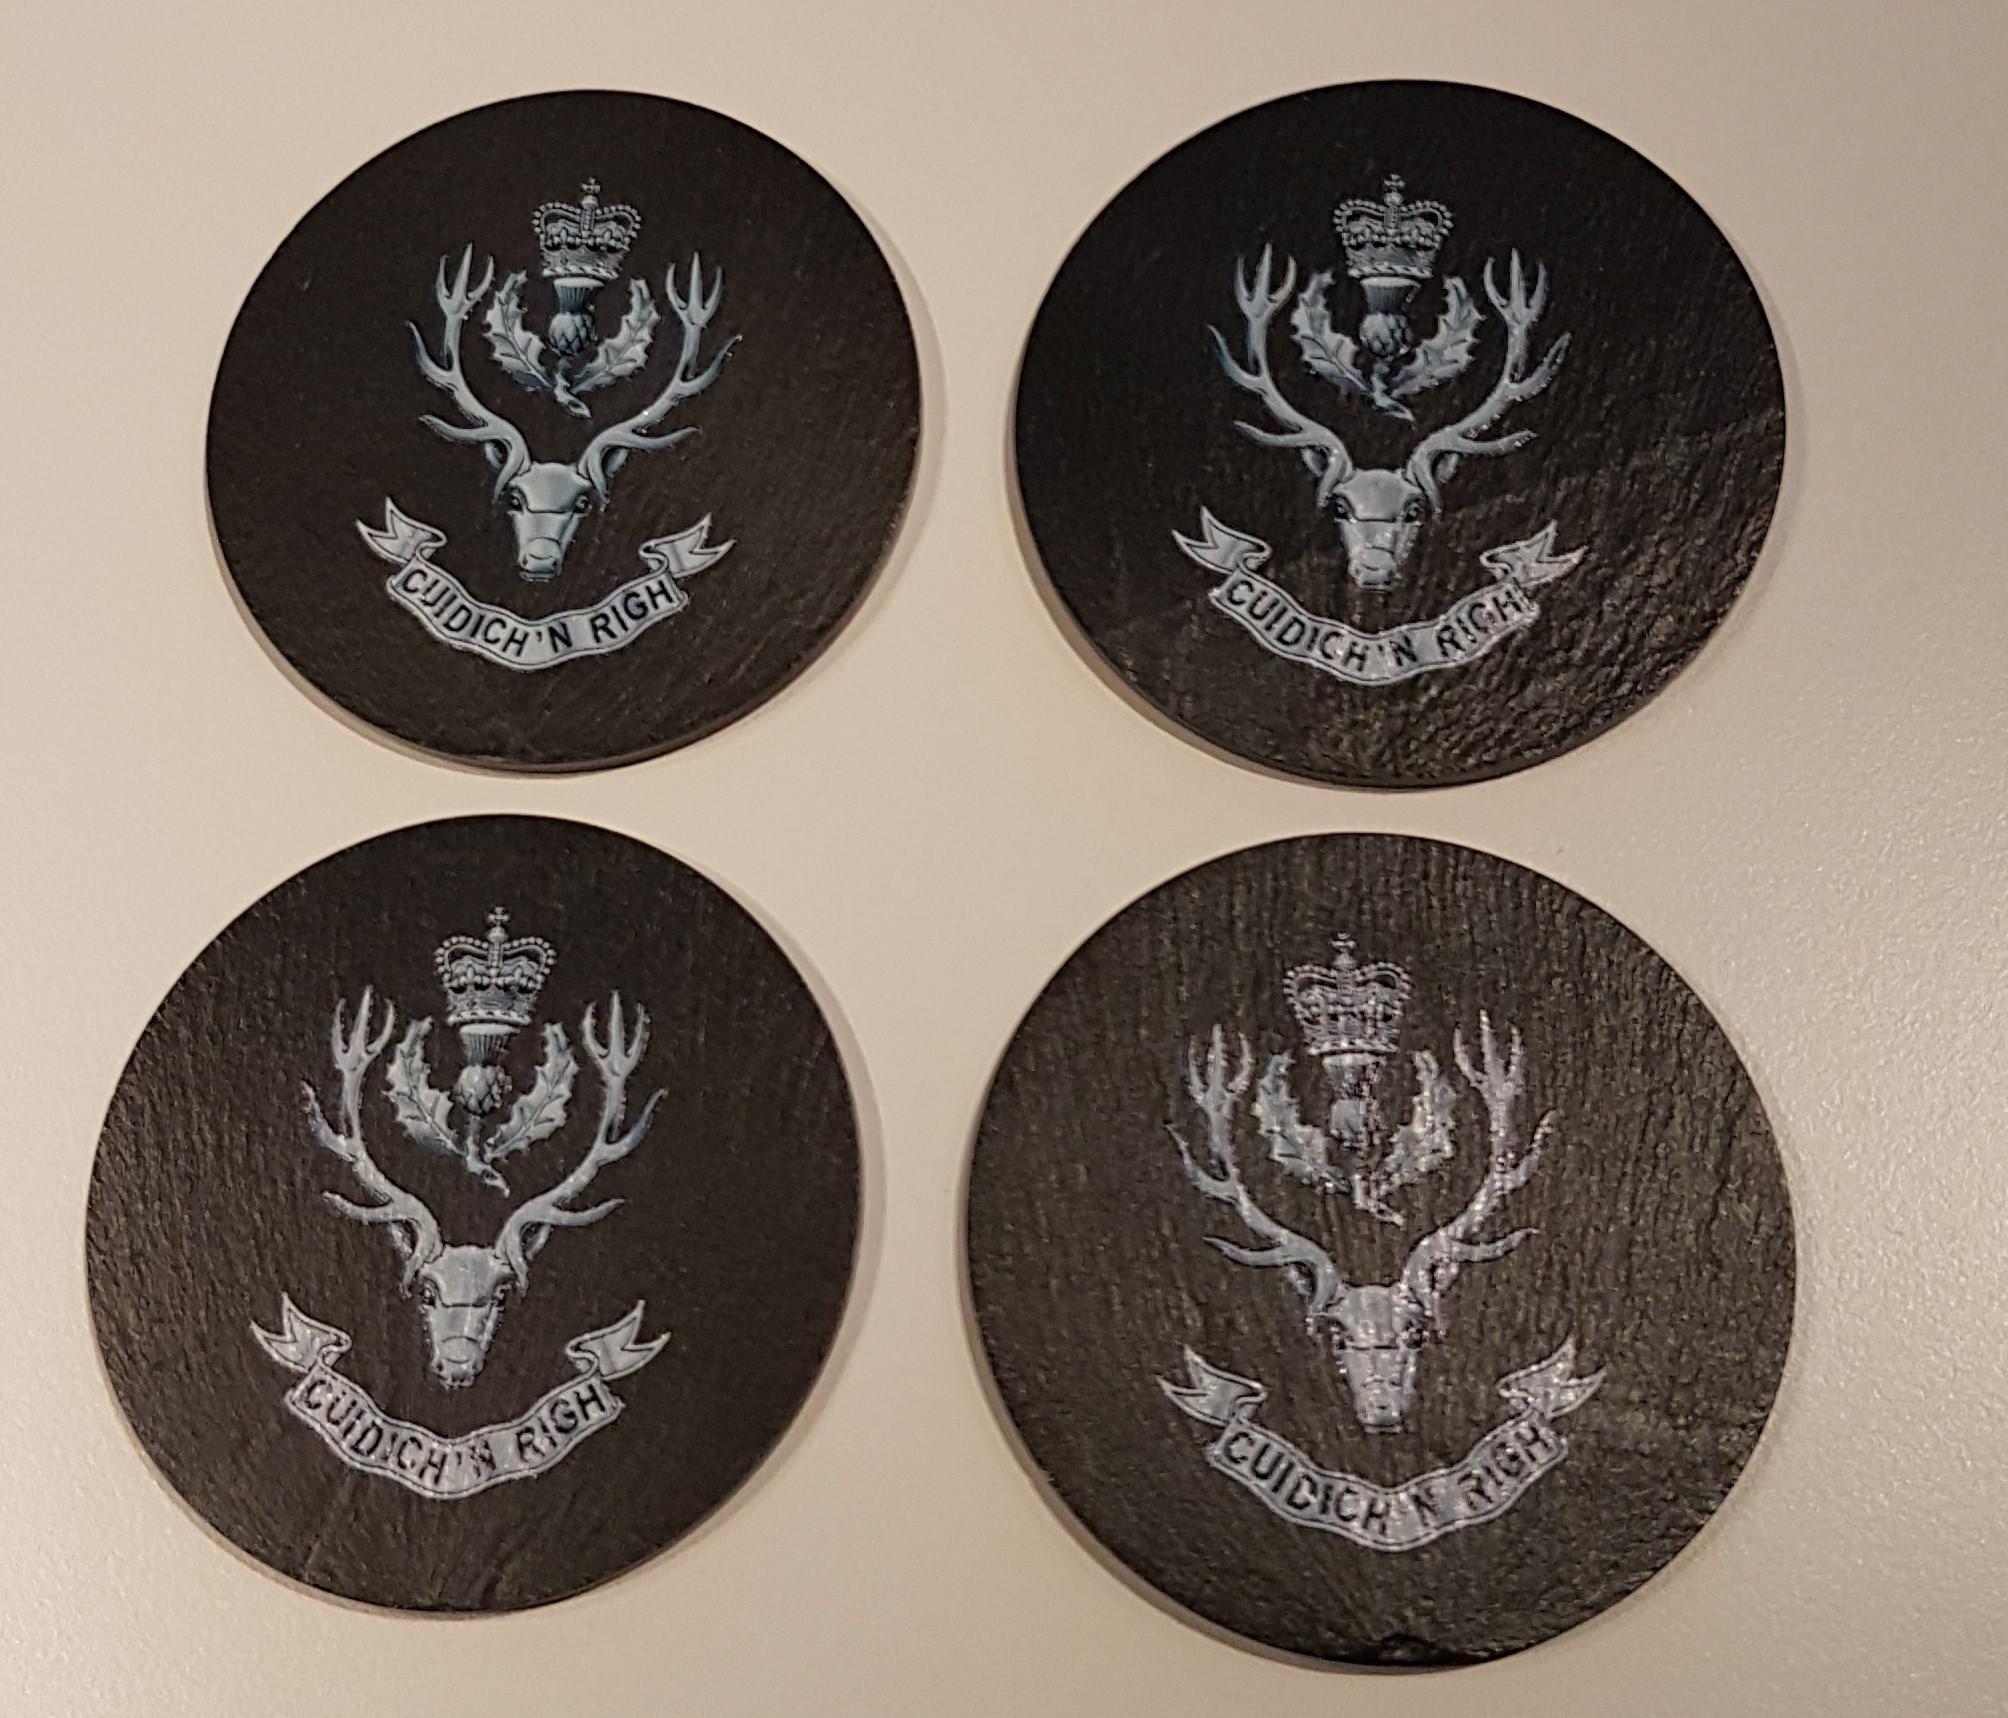 Slate Coasters - Queen's Own Highlanders